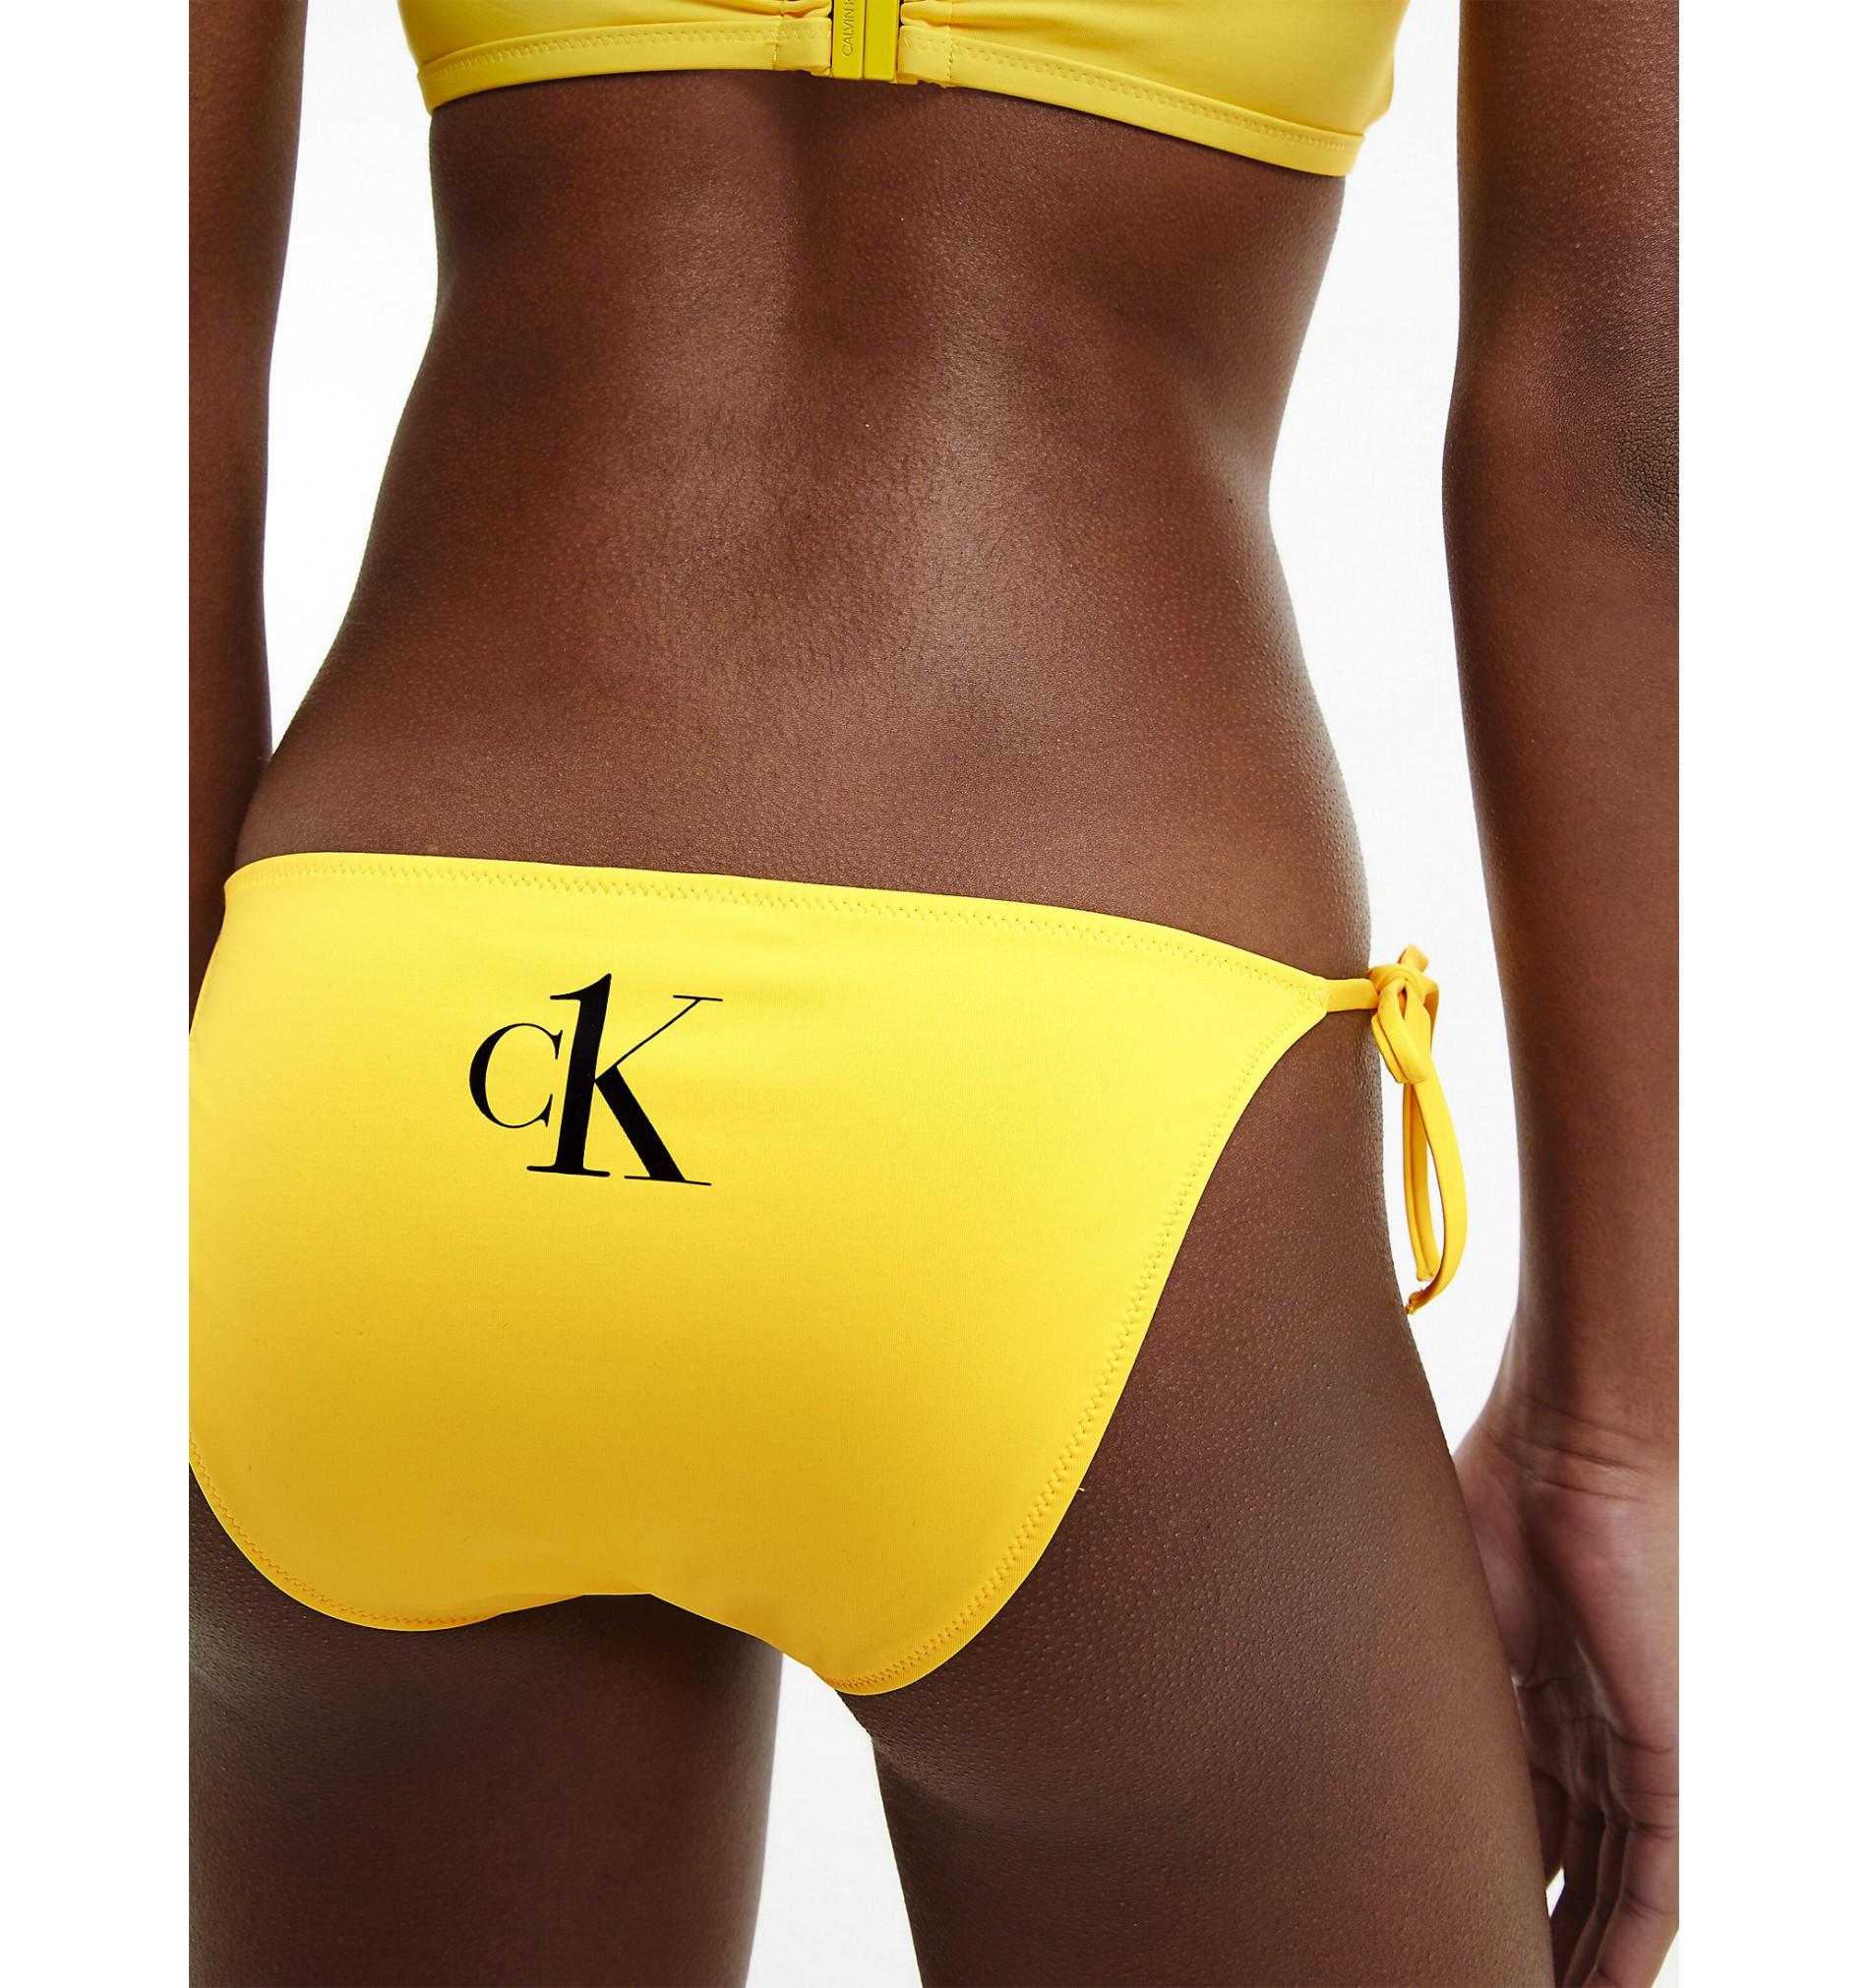 dámske plavky - BIKINI STRING 'HALTER NECK' žlté  ZGM